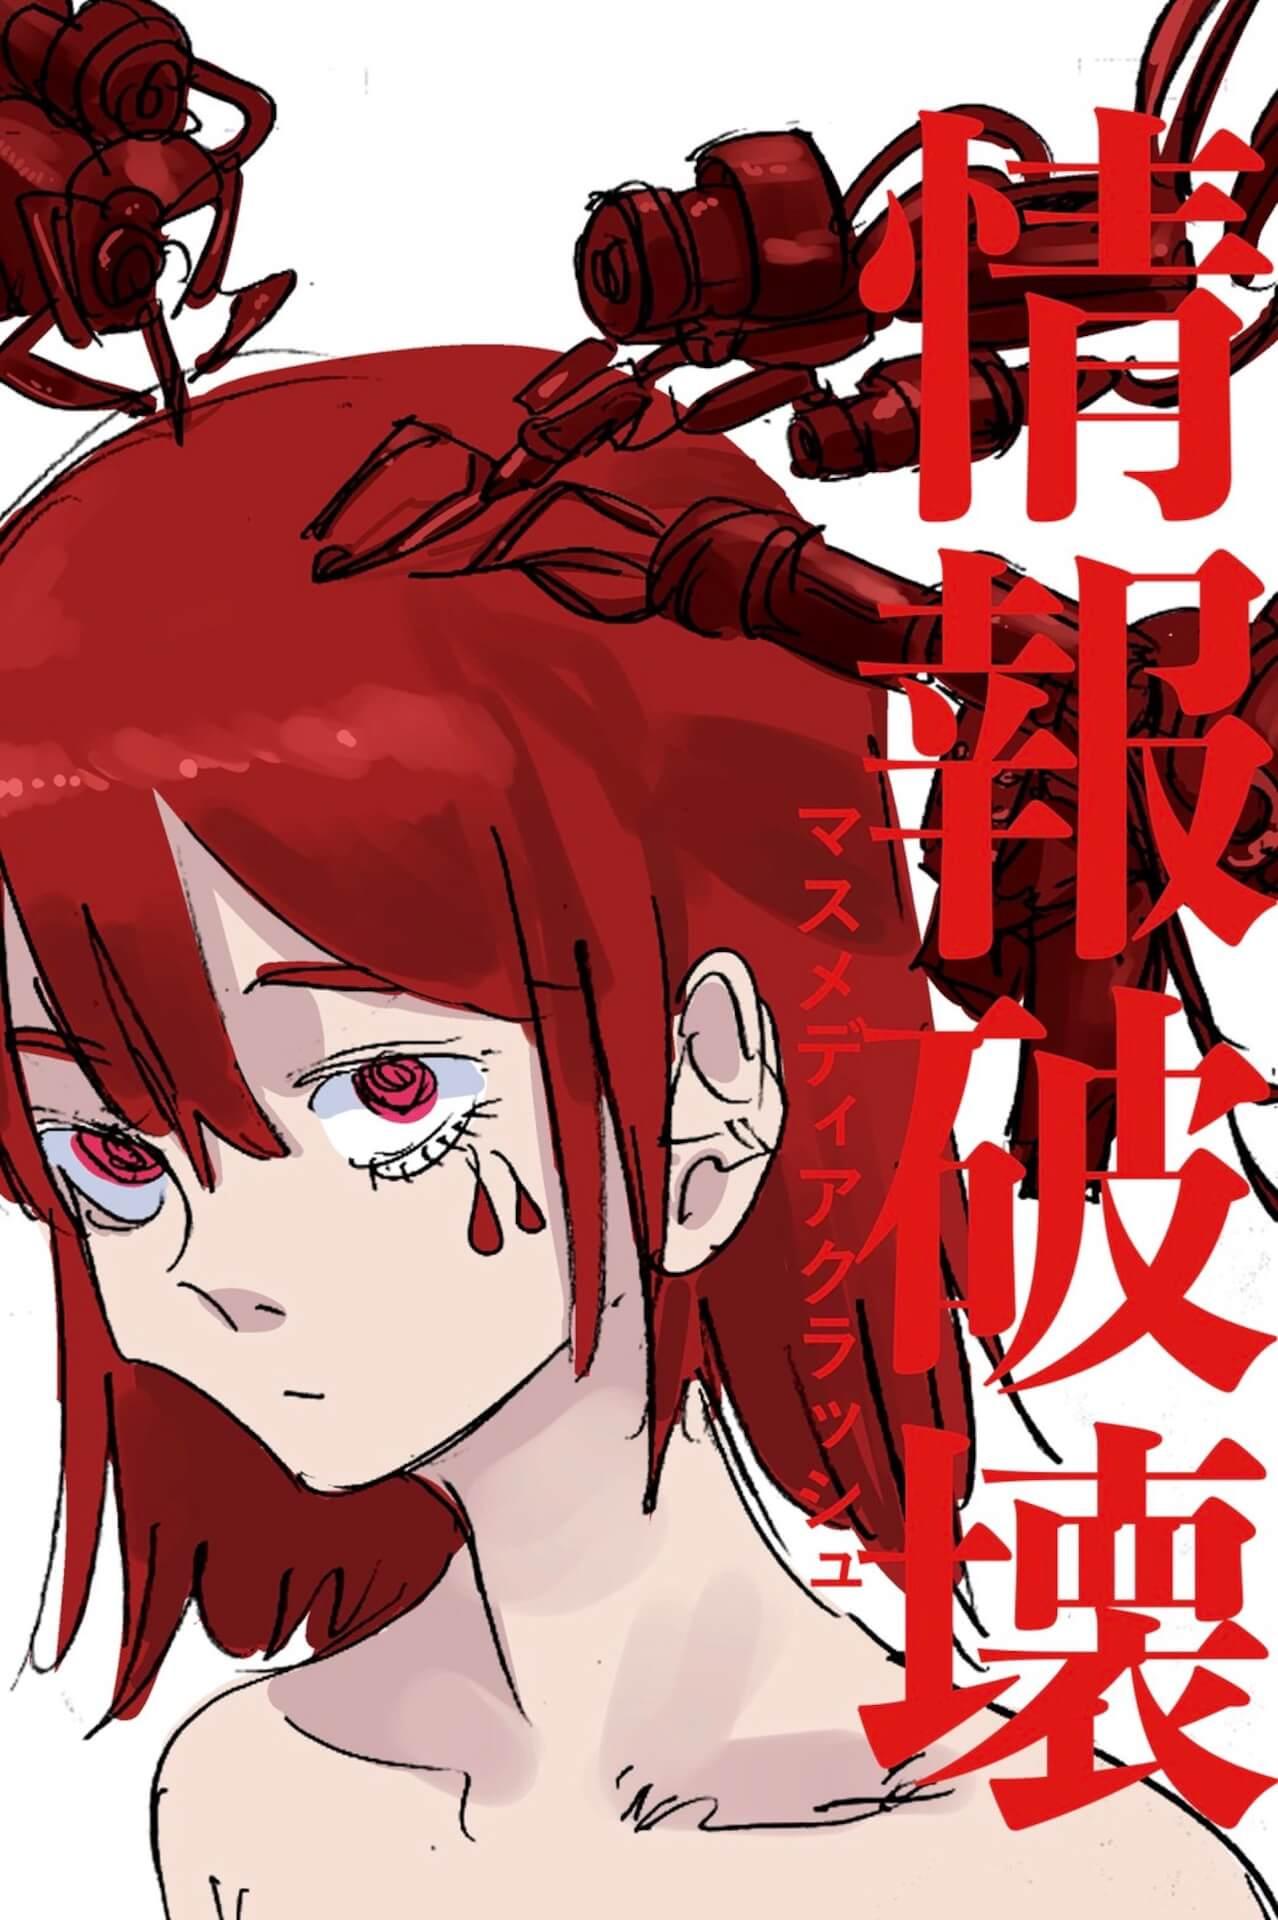 JUN INAGAWA個展『マスメディアクラッシュ』がSHIBUYA TSUTAYAにて開催決定!書籍購入者へのサイン会も fation210609_JUNINAGAWA11